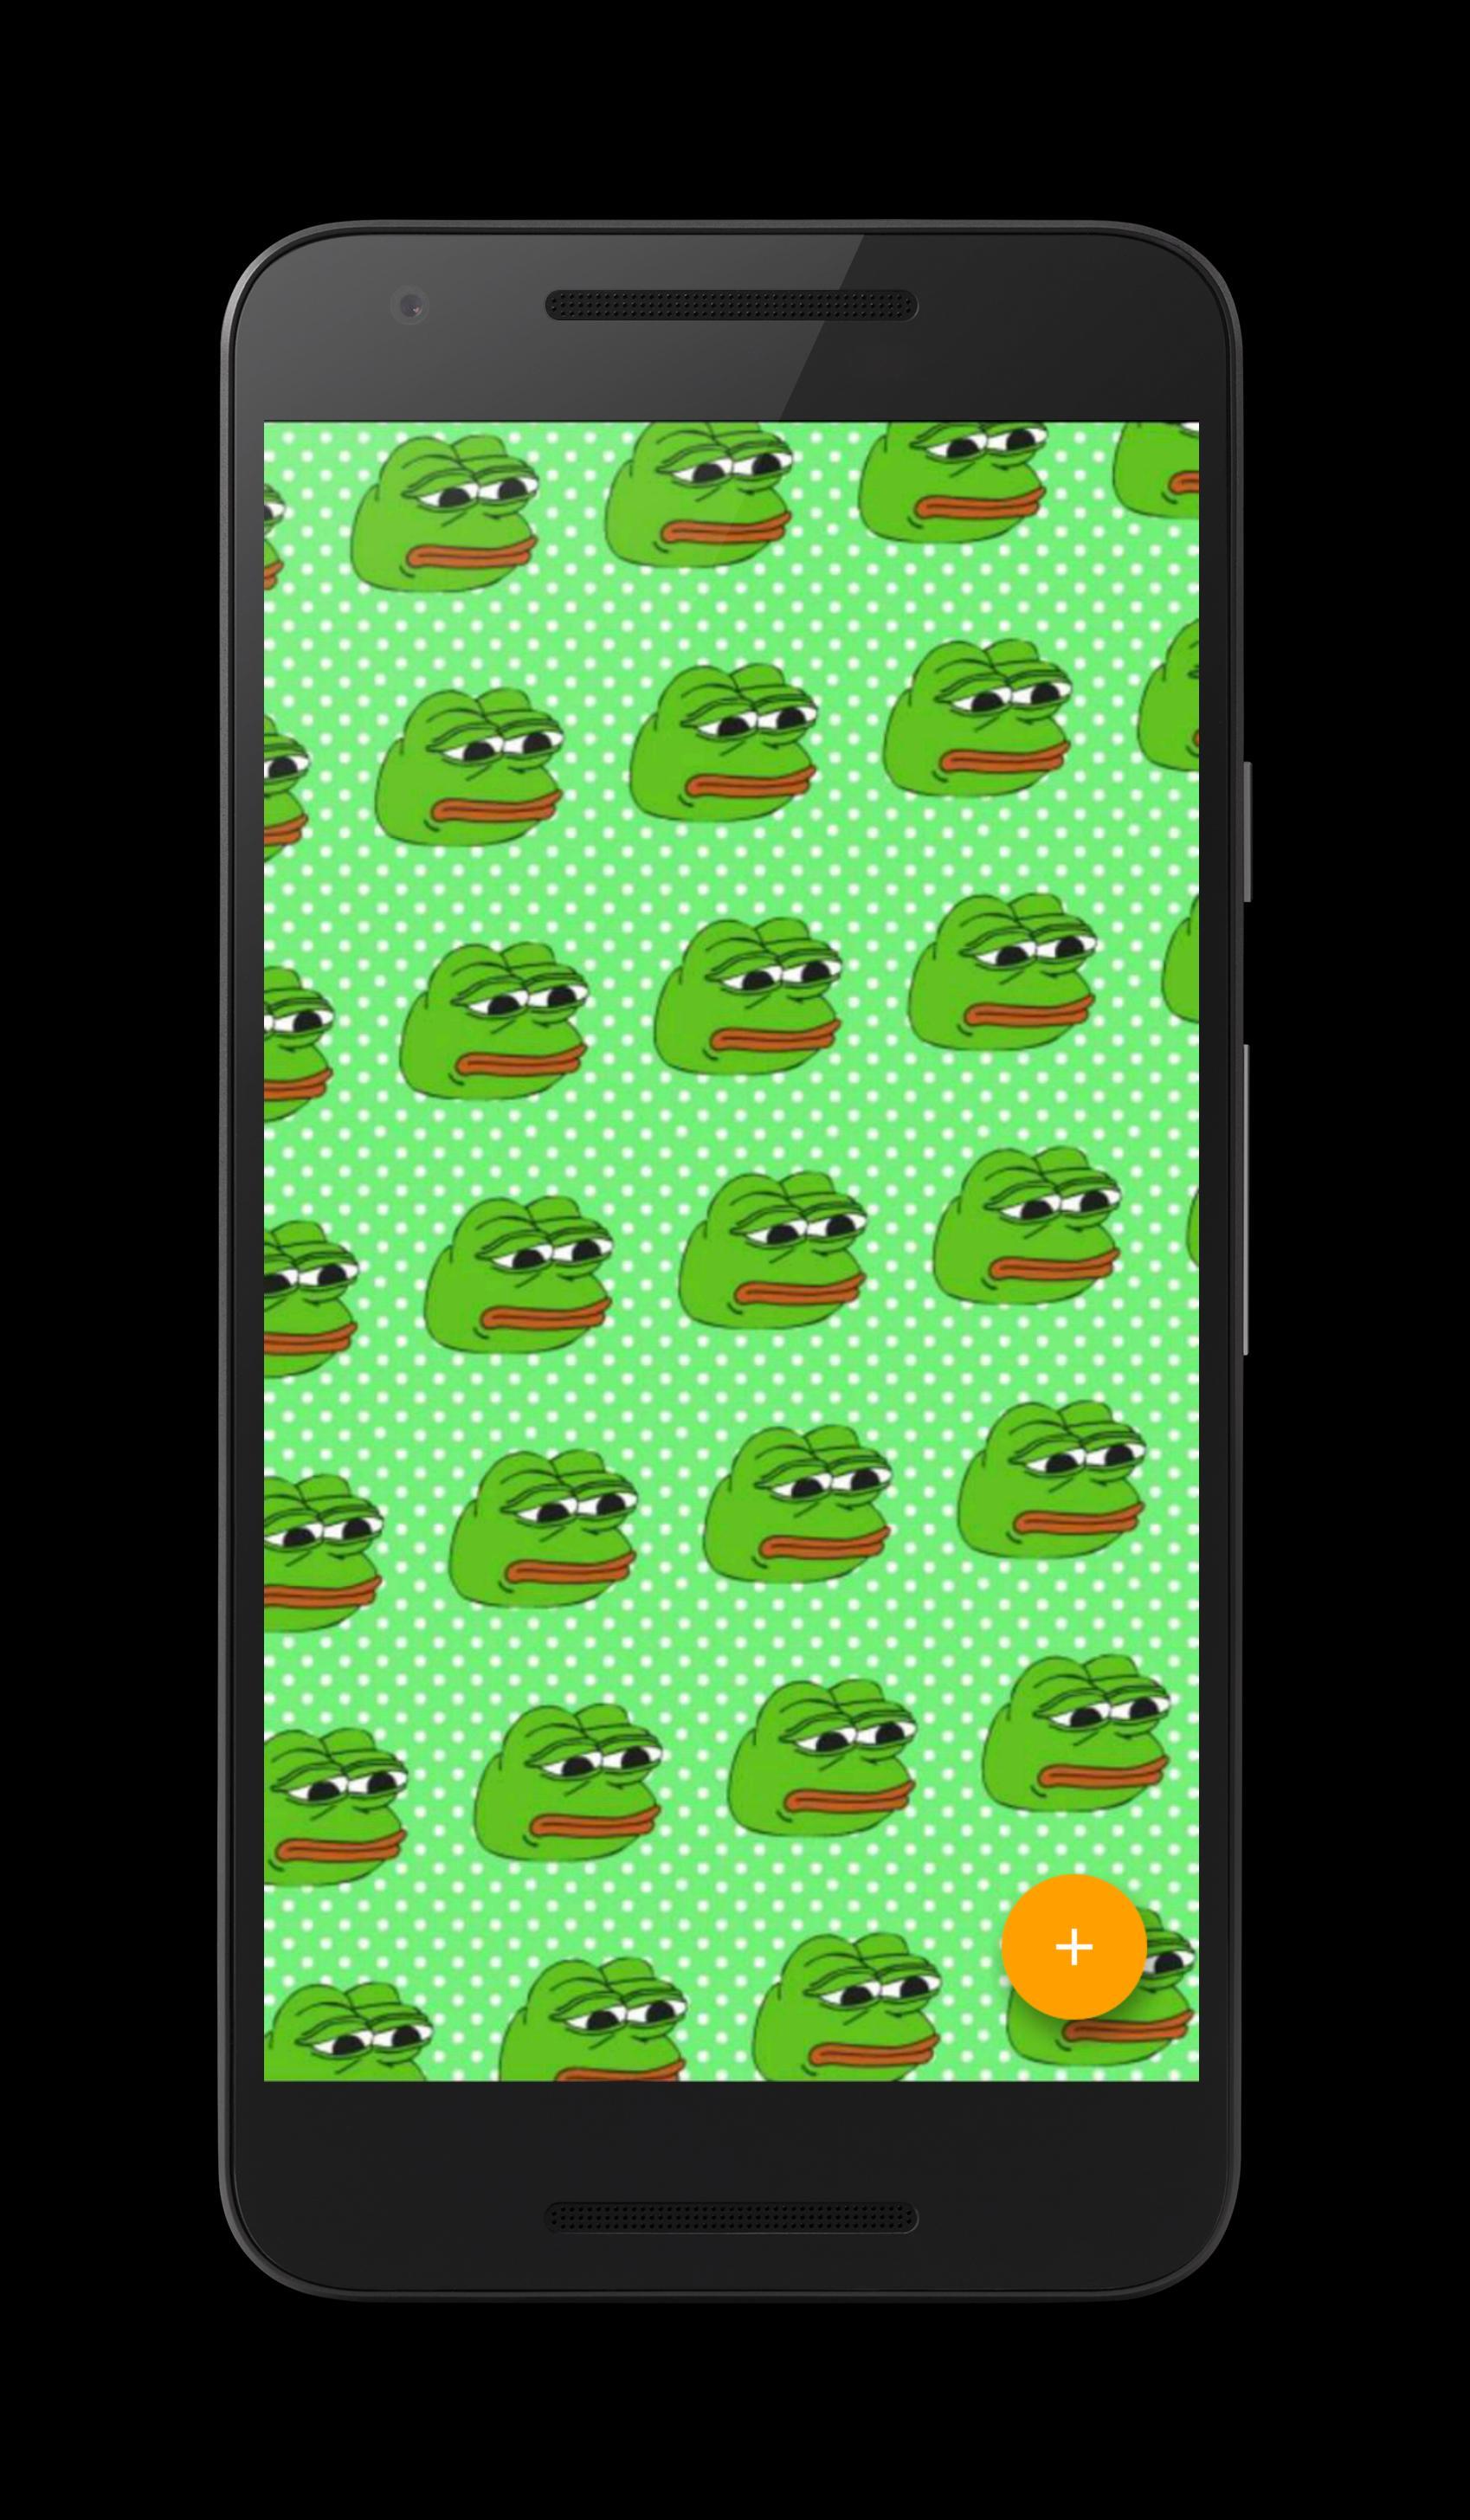 Meme Phone Wallpapers on WallpaperDog